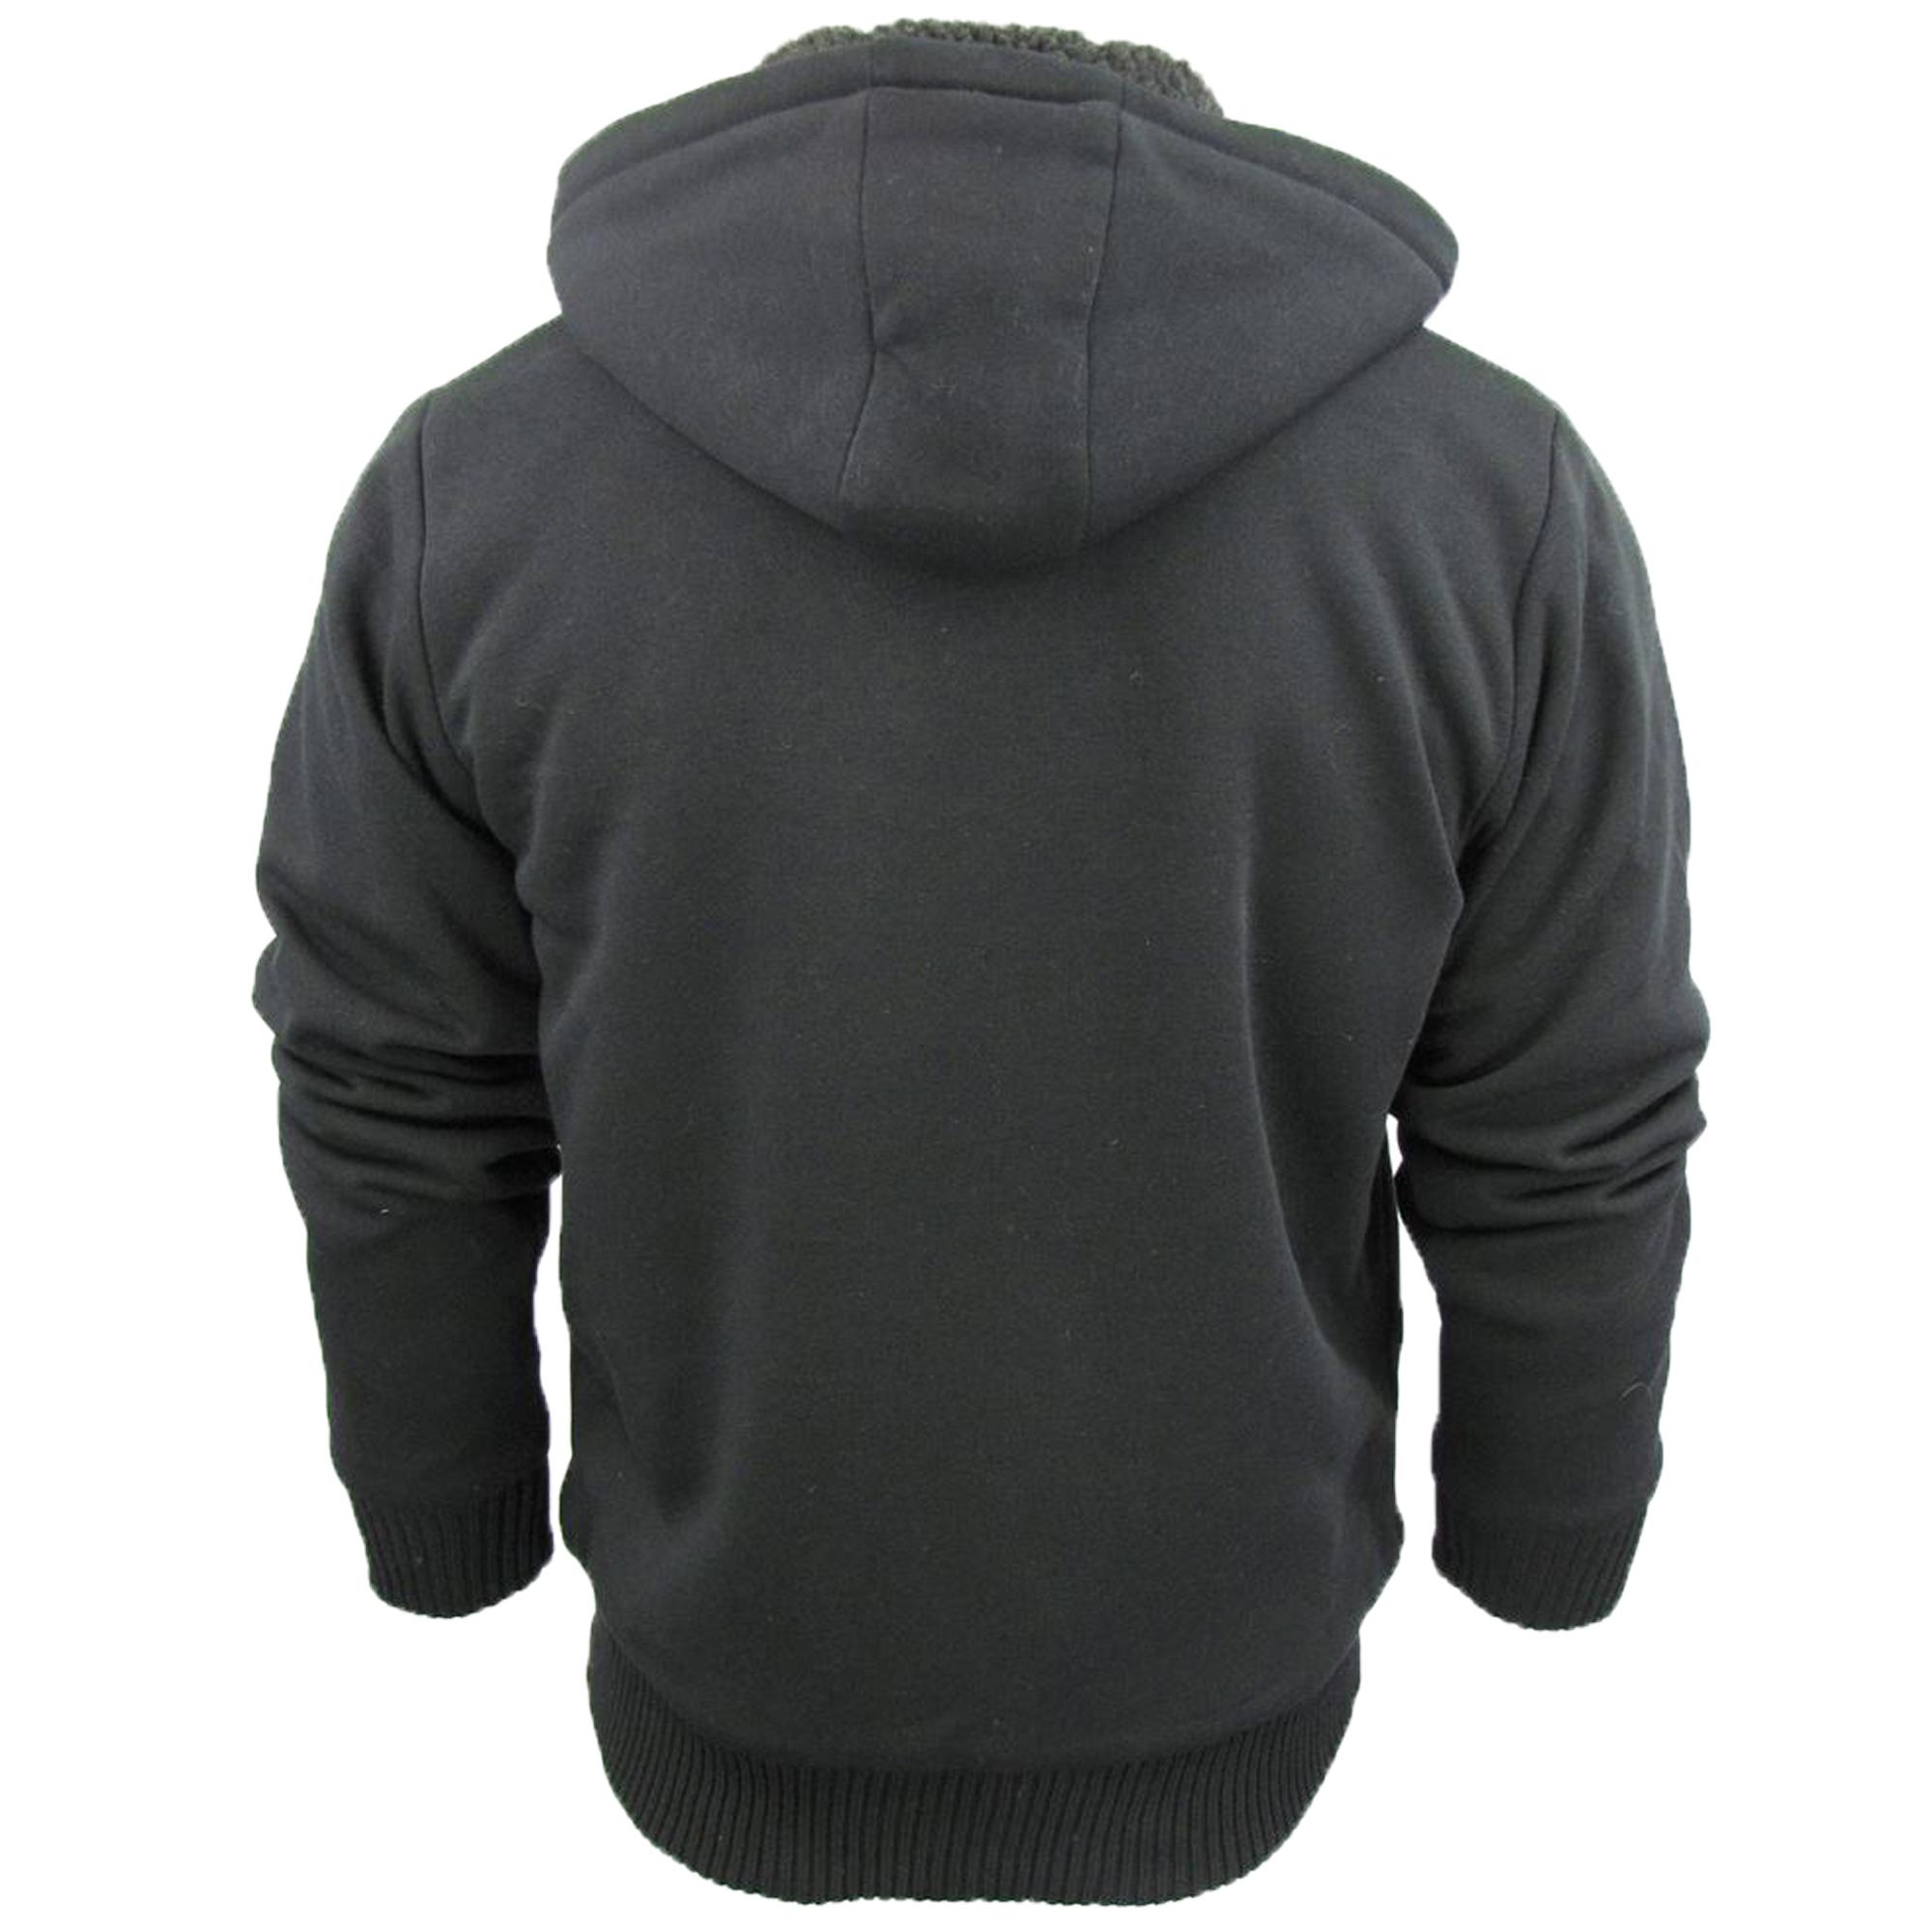 Mens-Jacket-Dissident-Sweatshirt-Hooded-Top-Sherpa-Fleece-Lined-Heavy-BOLO-New thumbnail 3